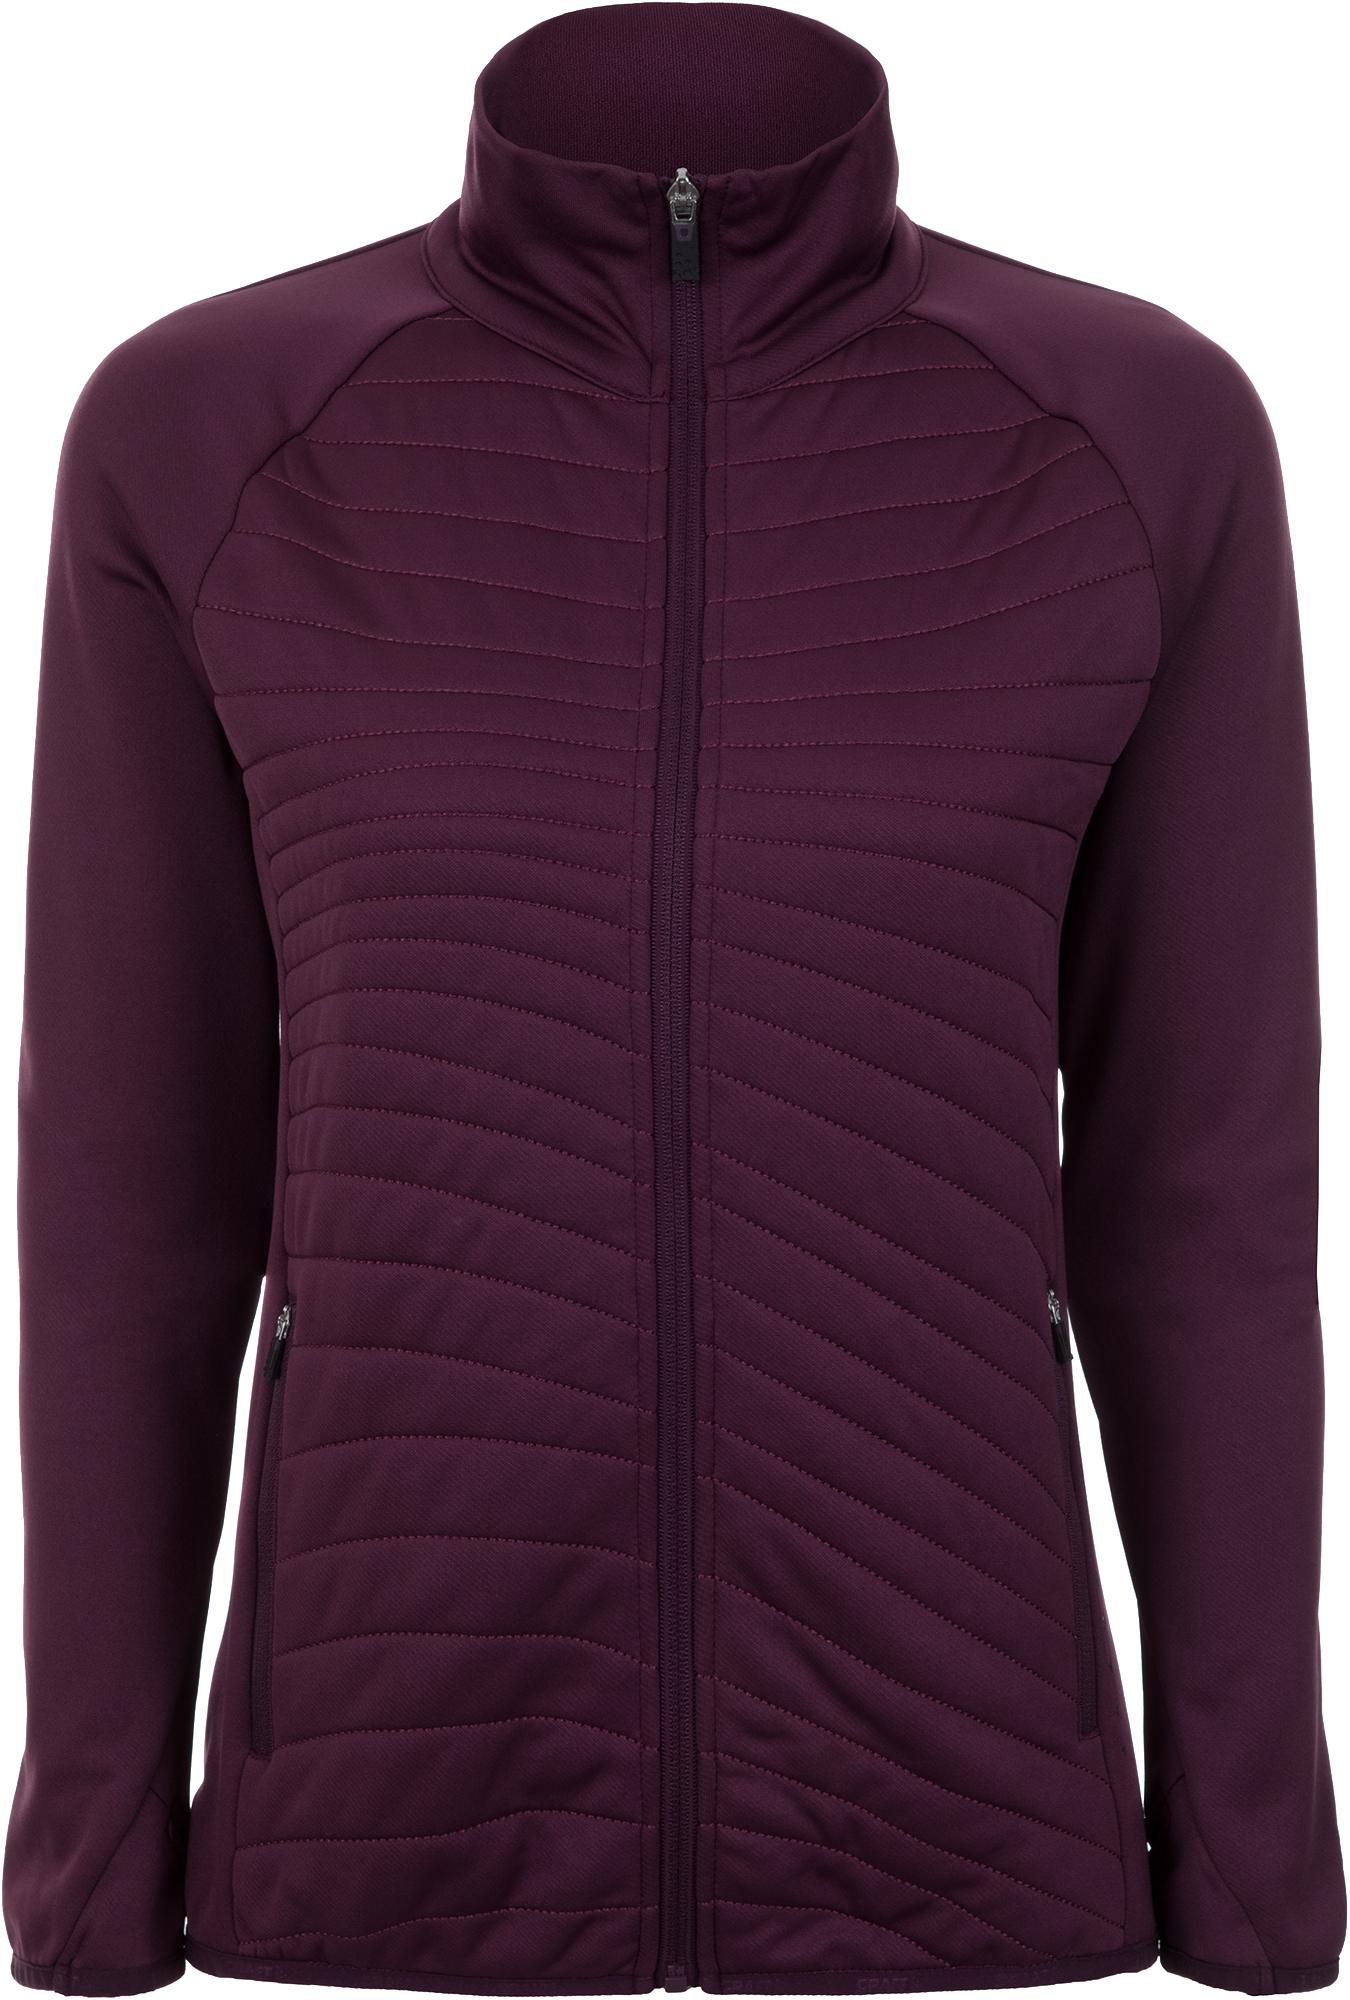 Craft Куртка женская Craft Breakaway Jersey Quilt, размер 44-46